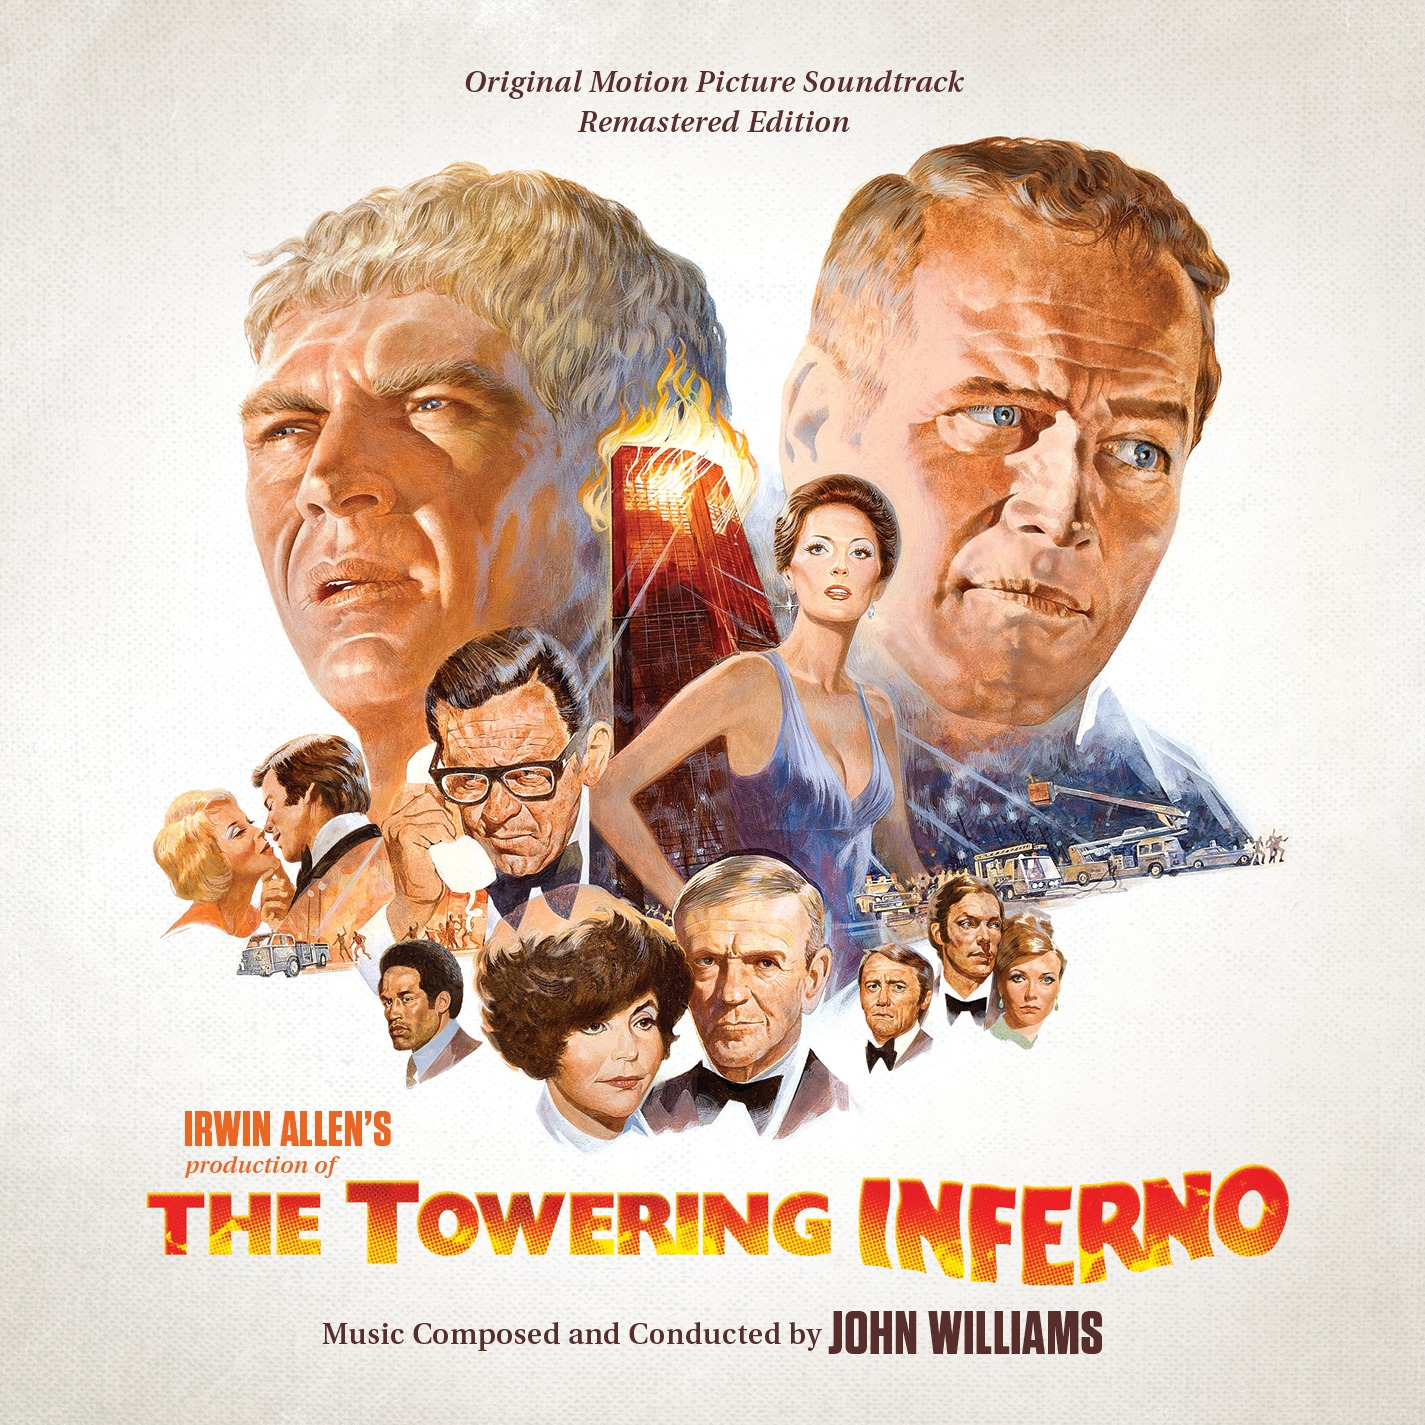 ToweringInferno_LLL